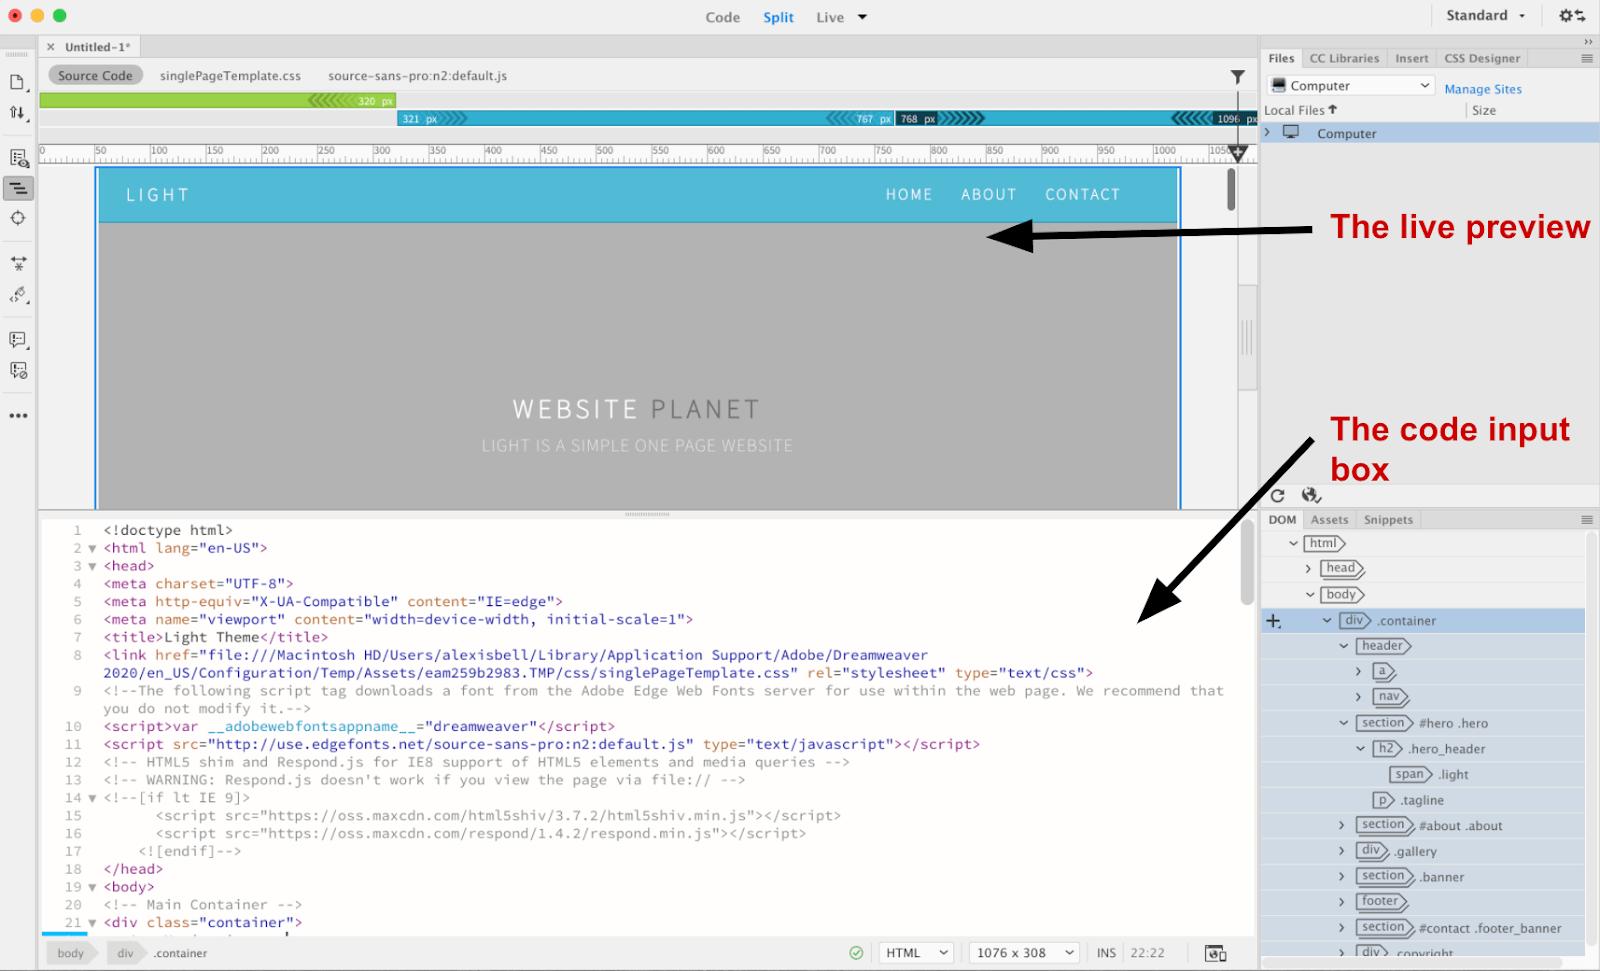 Dreamweaver dashboard - live HTML editor view